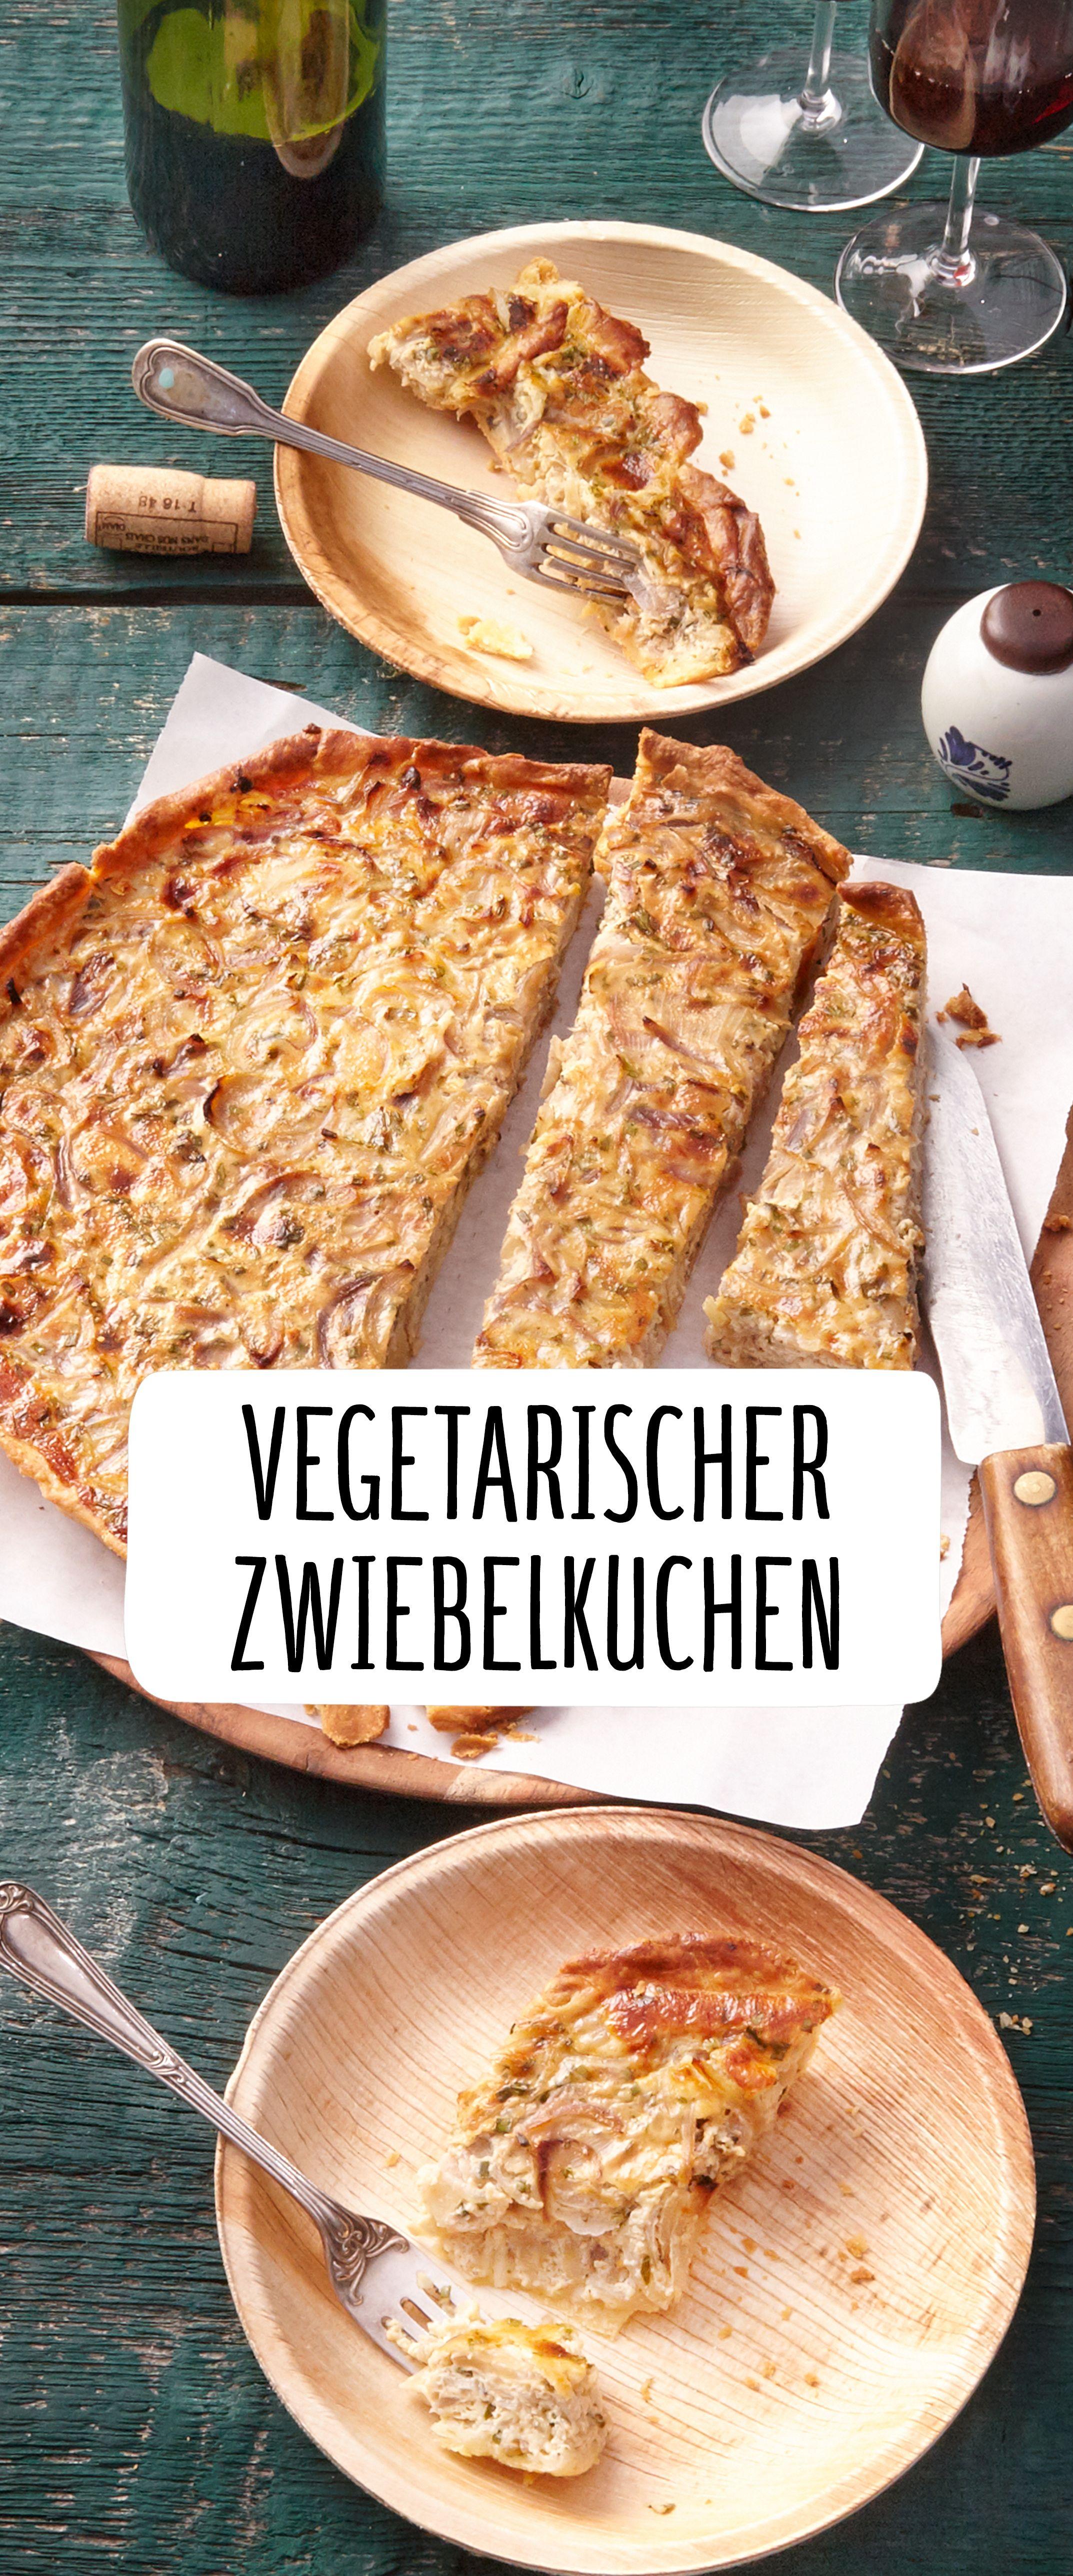 Vegetarischer Zwiebelkuchen Rezept Backen Pinterest